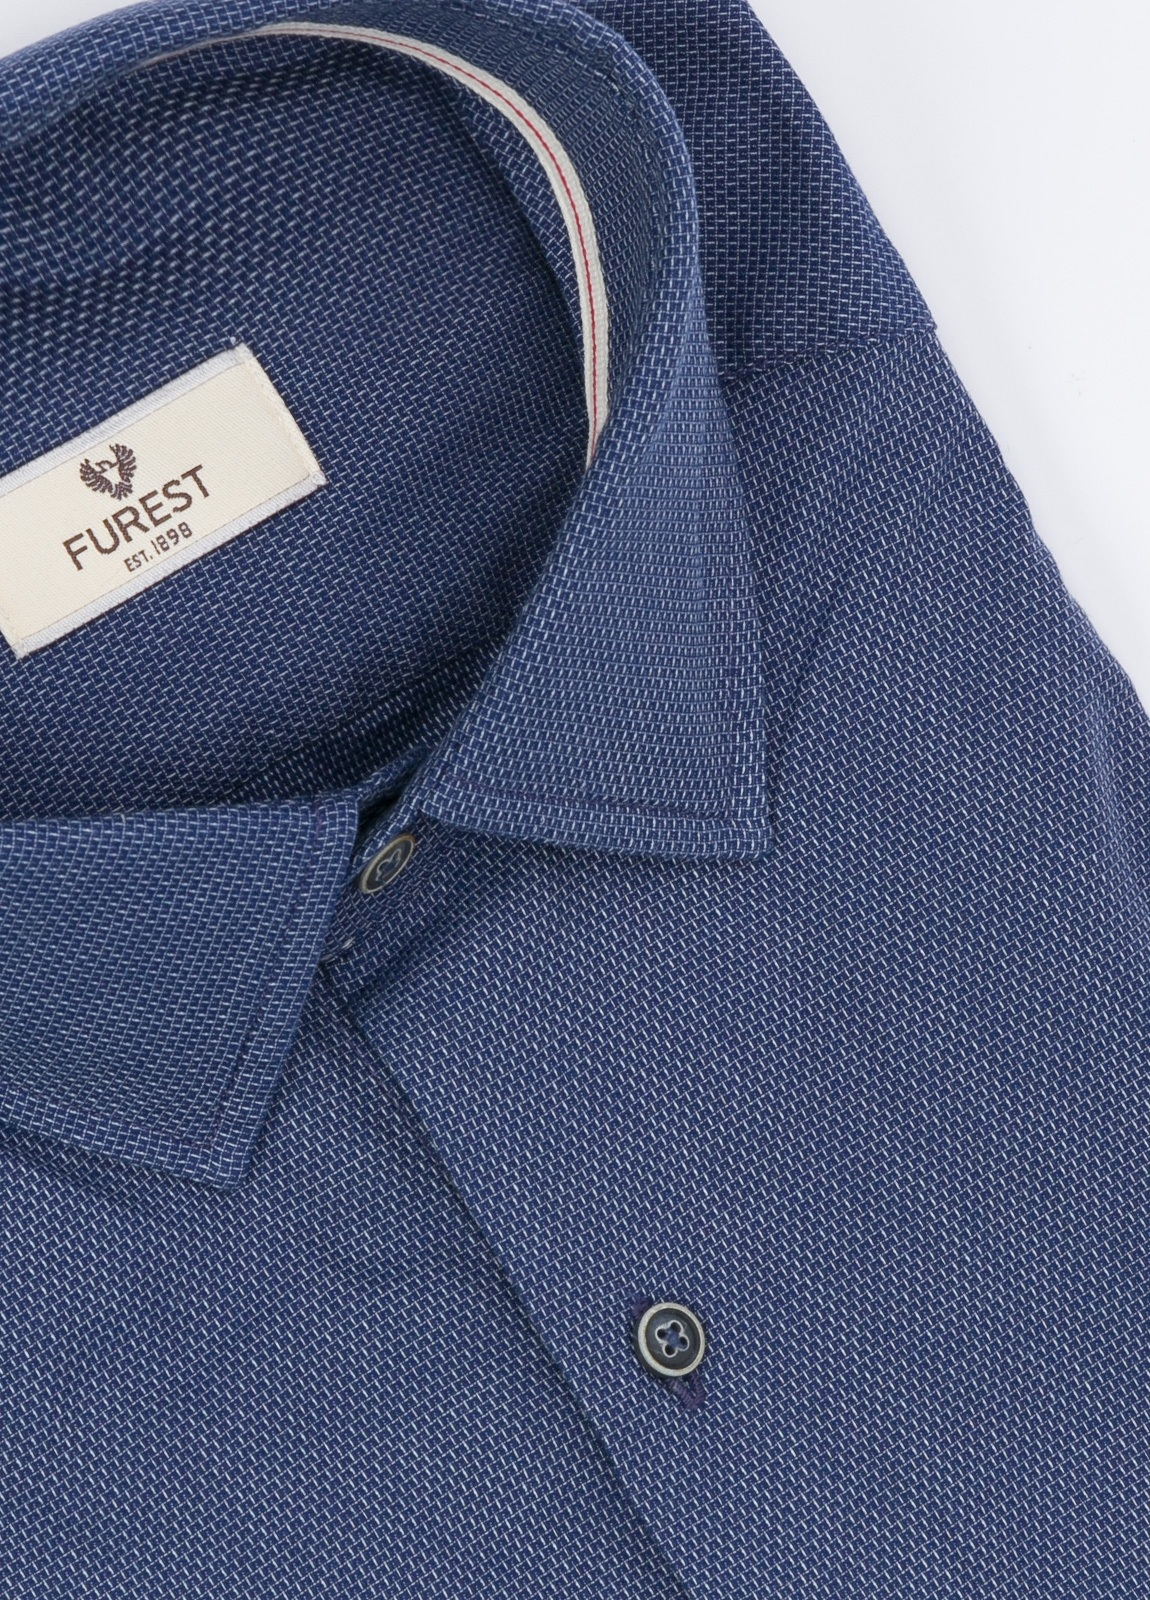 Camisa Leisure Wear SLIM FIT modelo PORTO,color azul marino. 100% Algodón. - Ítem1